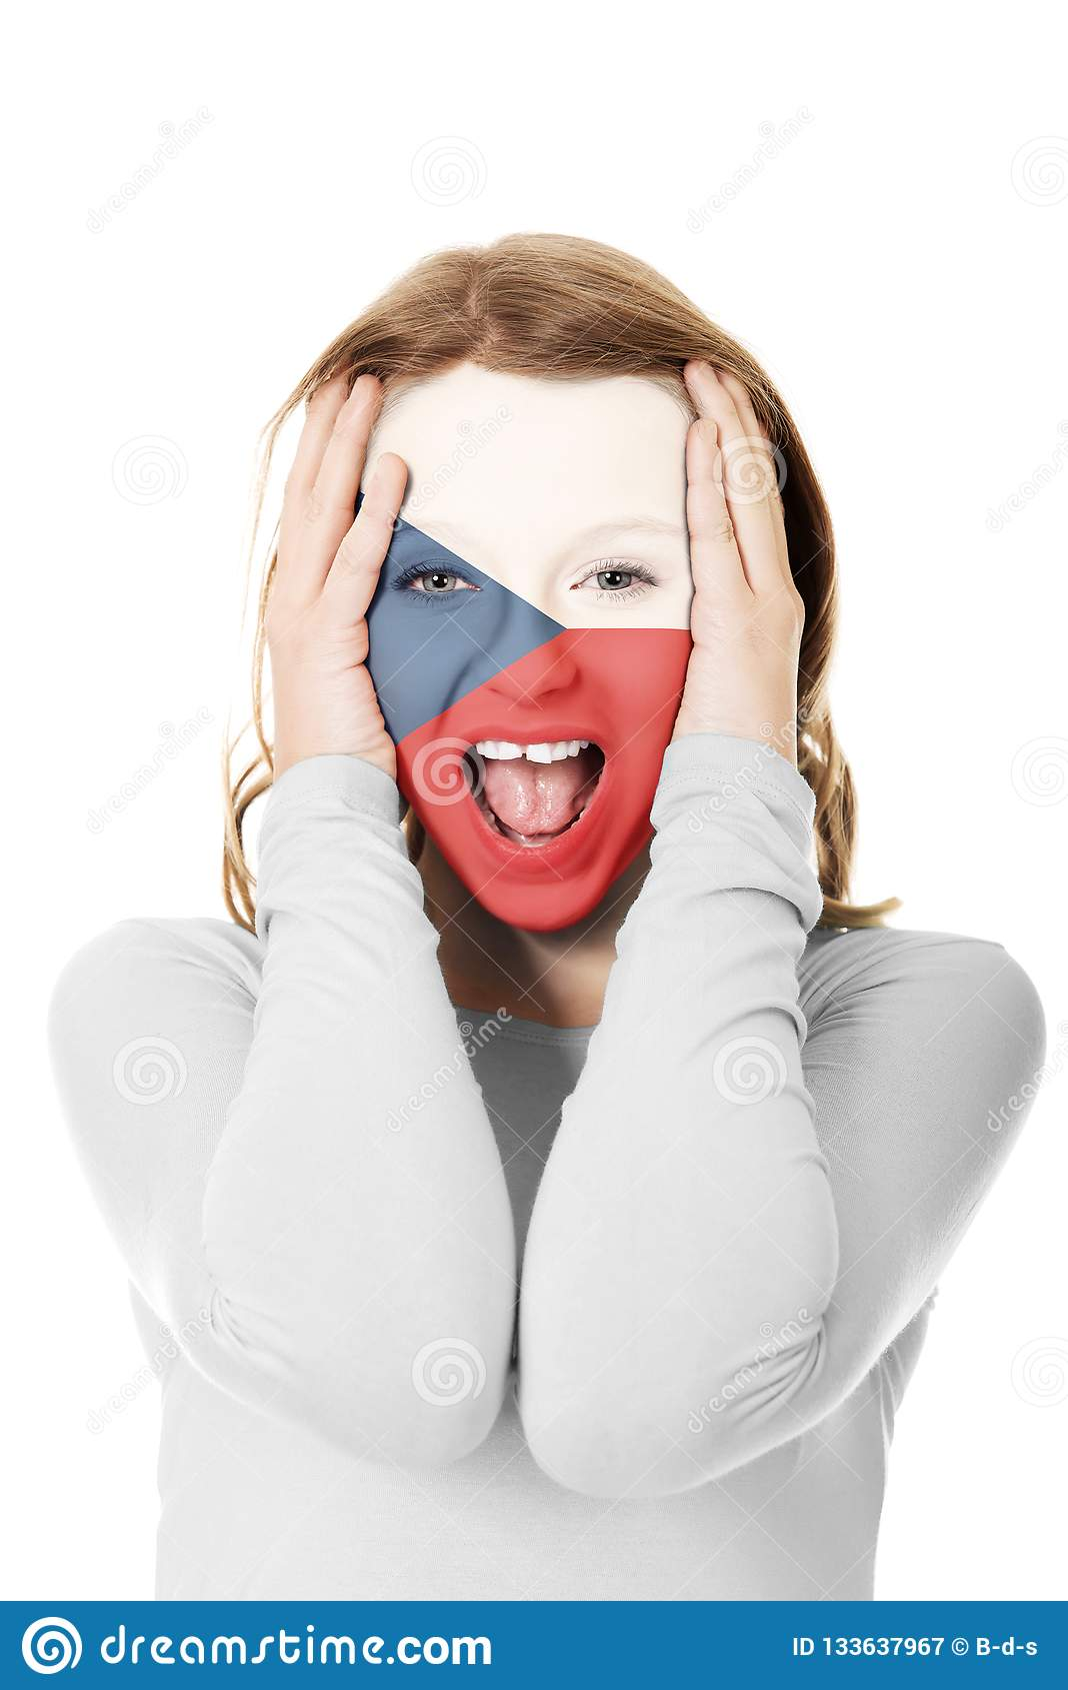 Czech Republic flag on woman`s face.